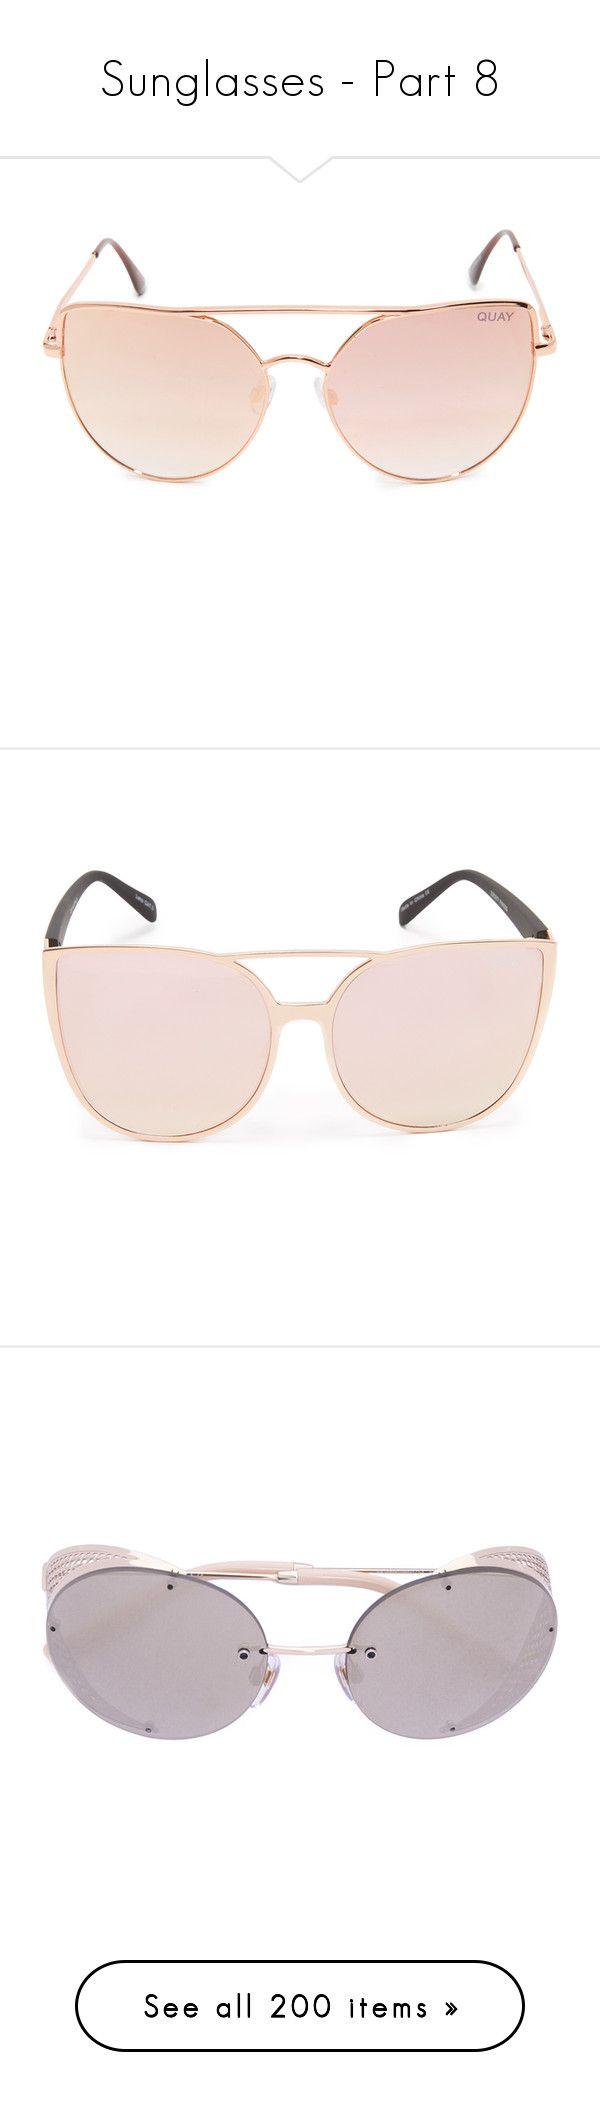 """Sunglasses - Part 8"" by emavera ❤ liked on Polyvore featuring accessories, eyewear, sunglasses, cat eye aviators, cat eye aviator sunglasses, mirror aviator sunglasses, mirrored aviators, mirror sunglasses, oversized sunglasses and quay eyewear"